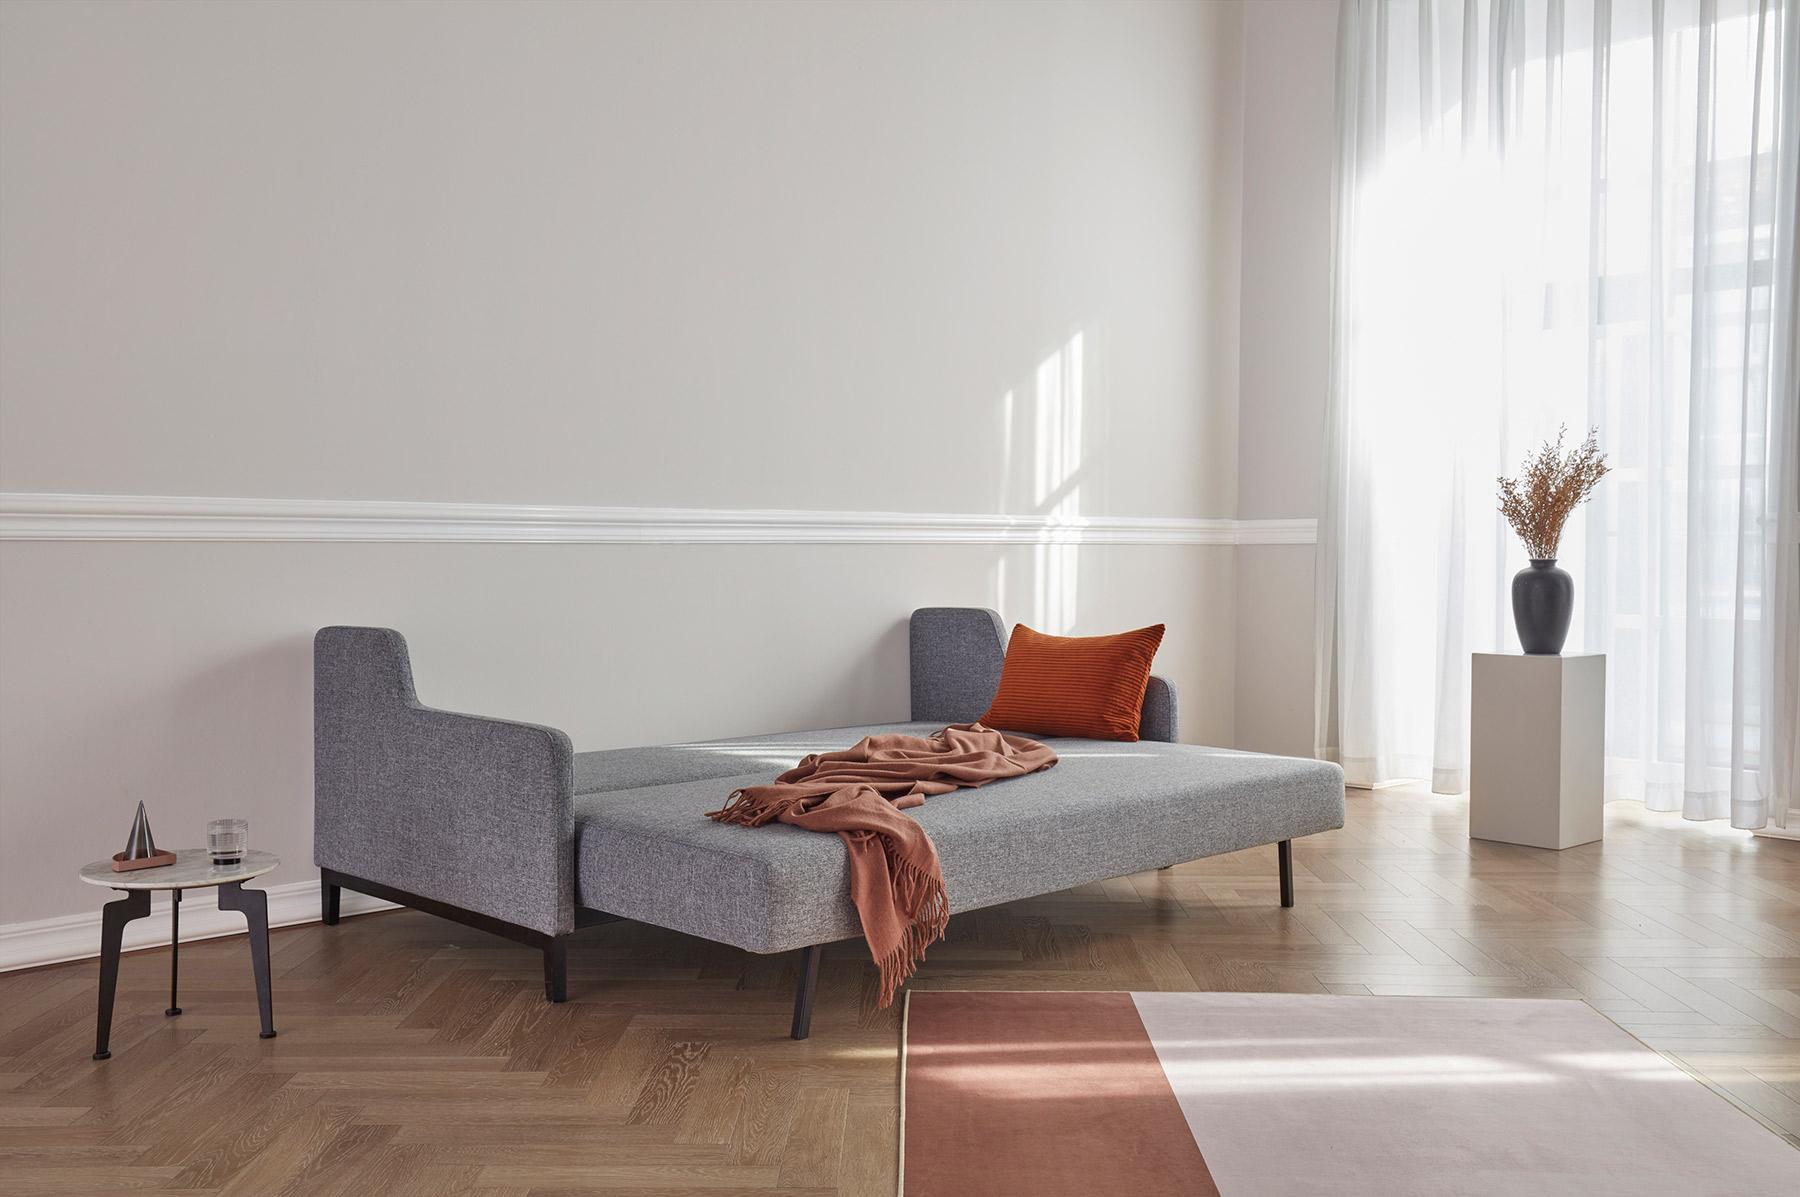 media/image/Hermod-Sofa-Bed-565-e2-web.jpg